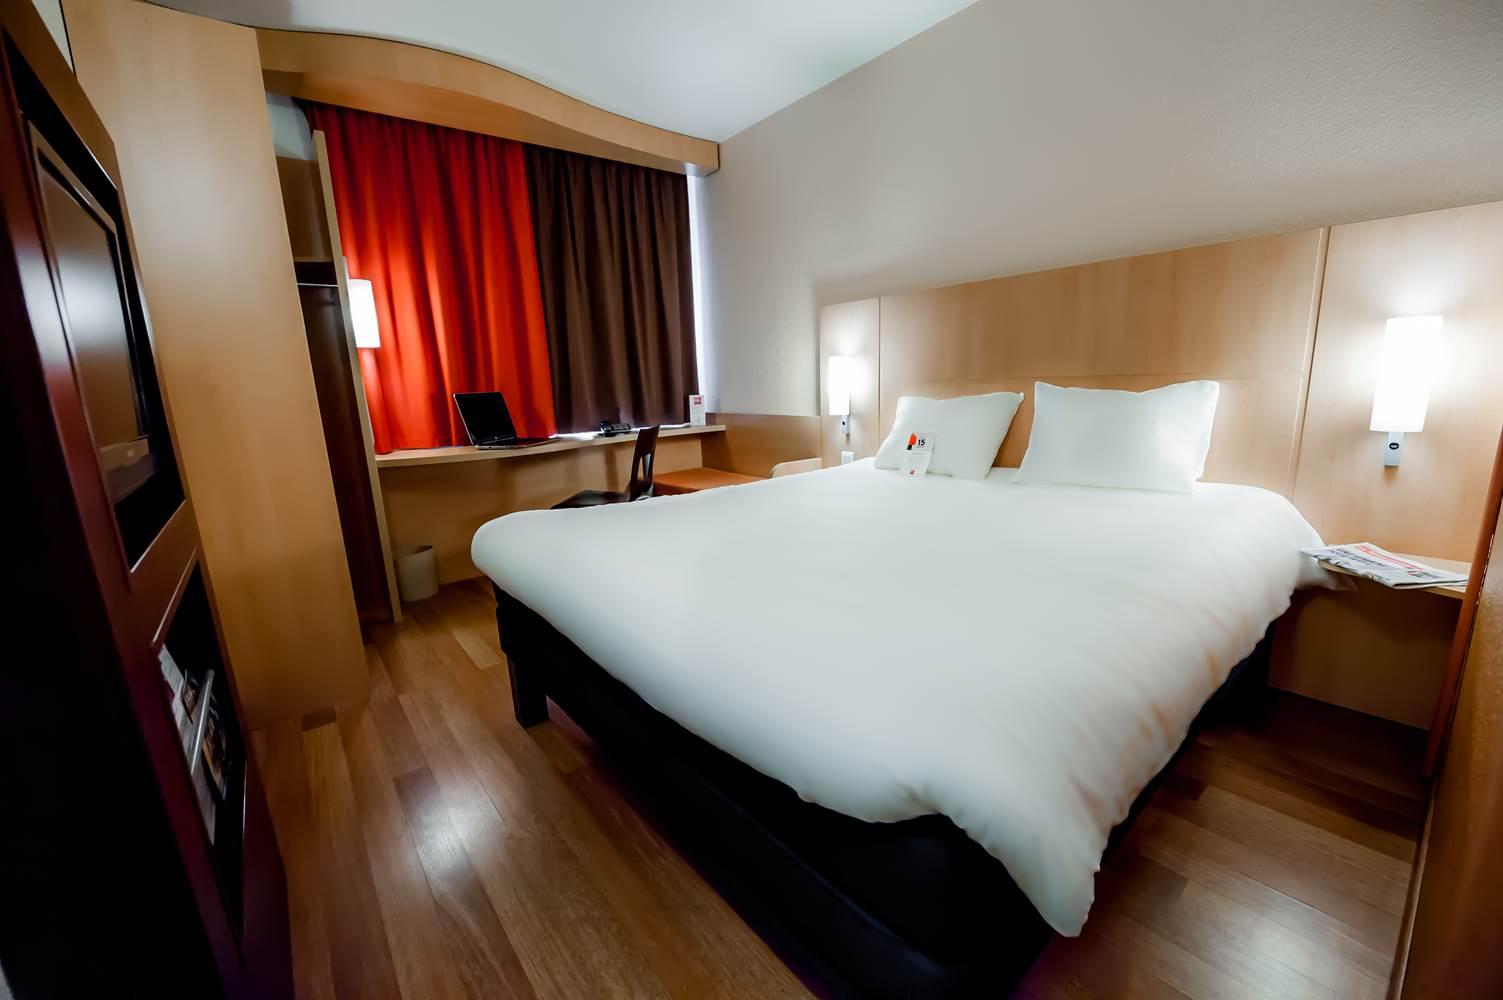 hotel ibis vannes chambre double ©